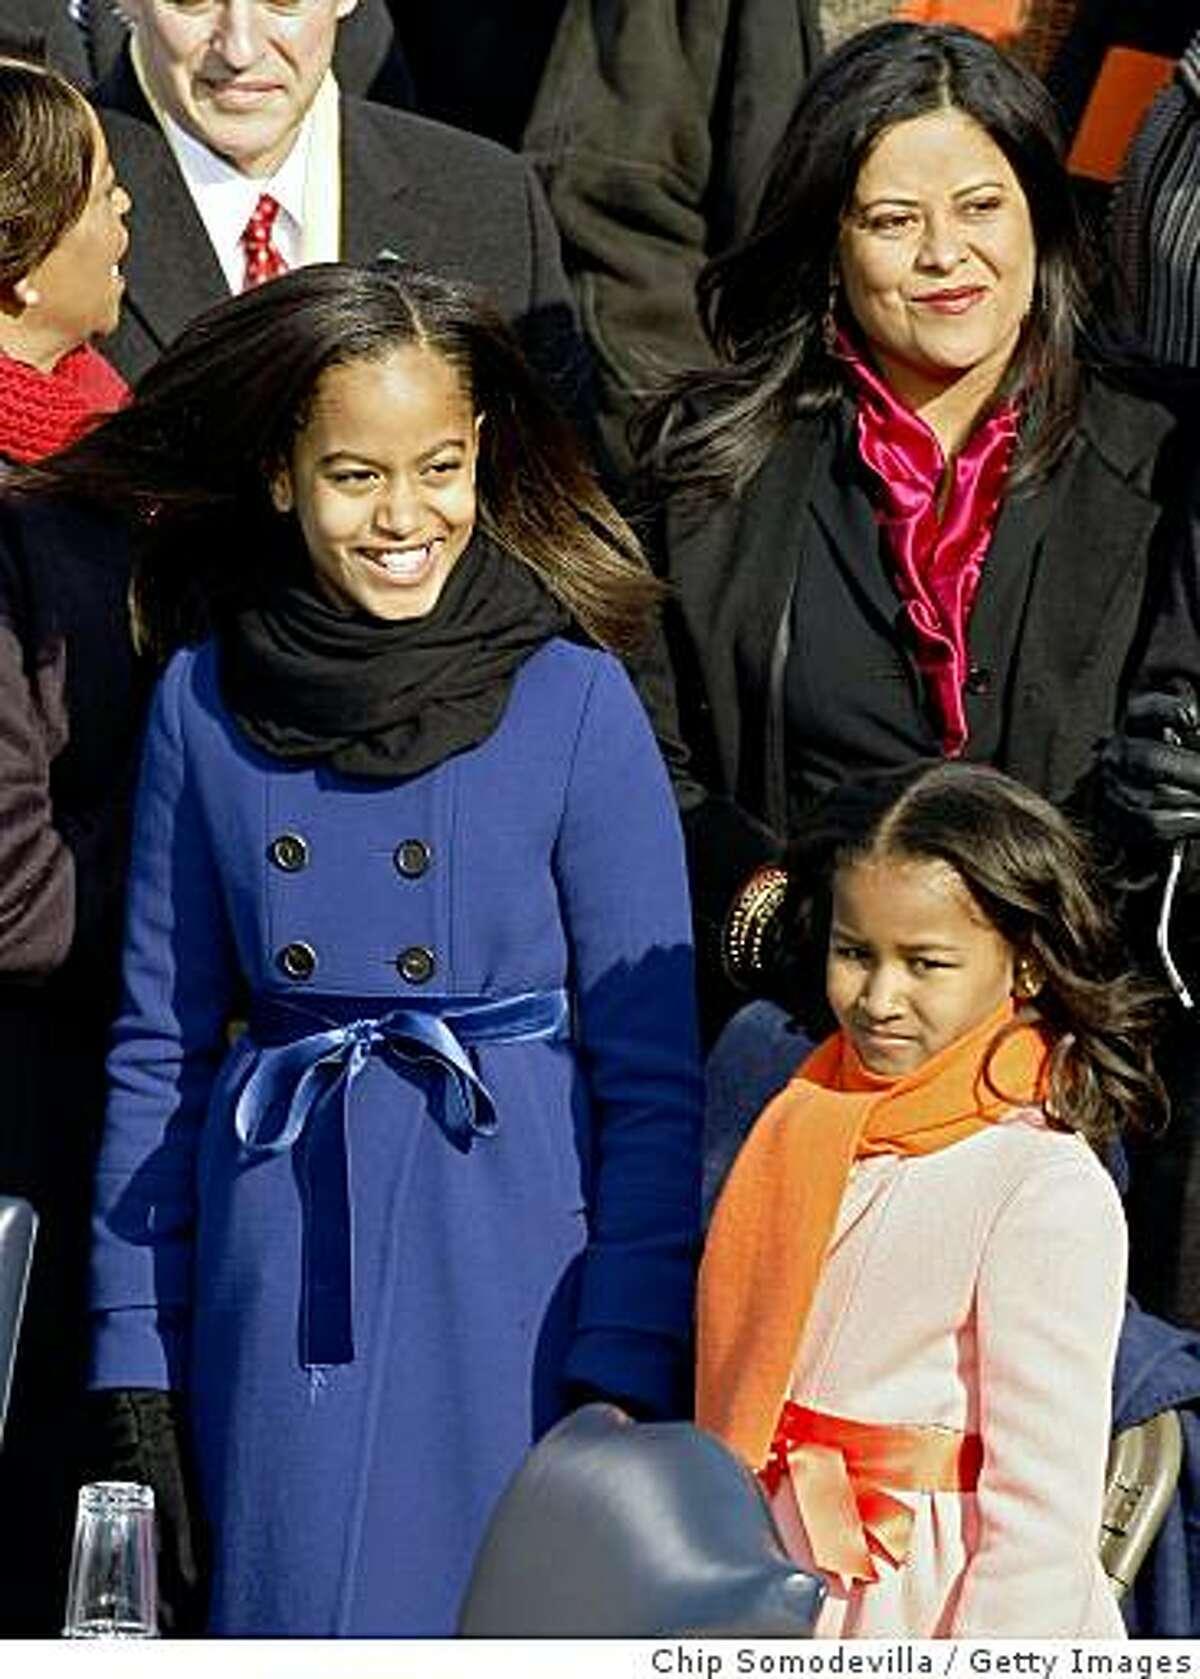 Malia and Sasha Obamam stand on the stage ahead of the inauguration.